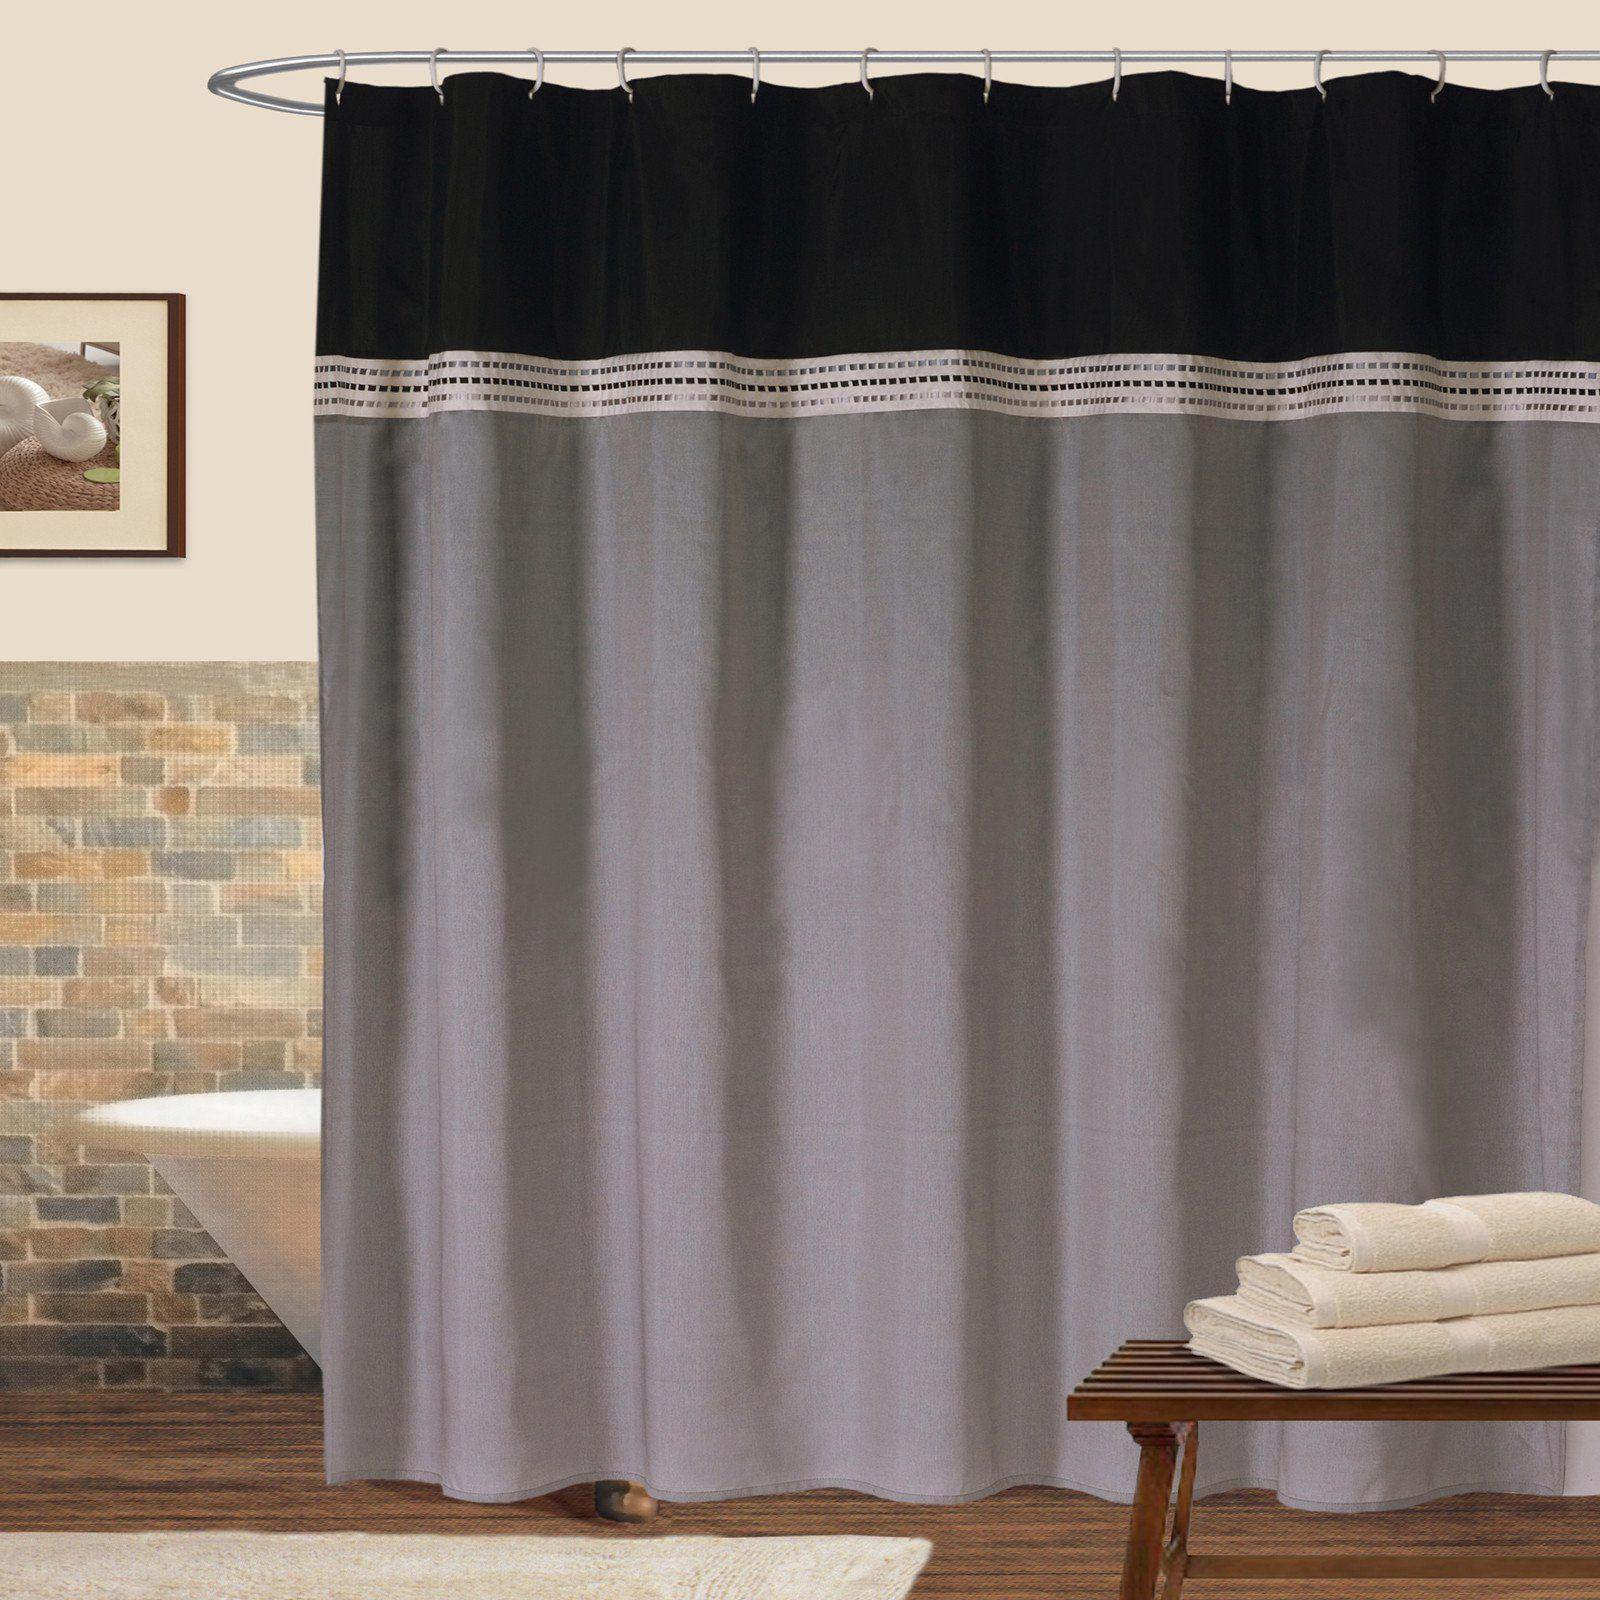 Terra Shower Curtain Black Shower Curtains Curtains Shower Curtains Walmart